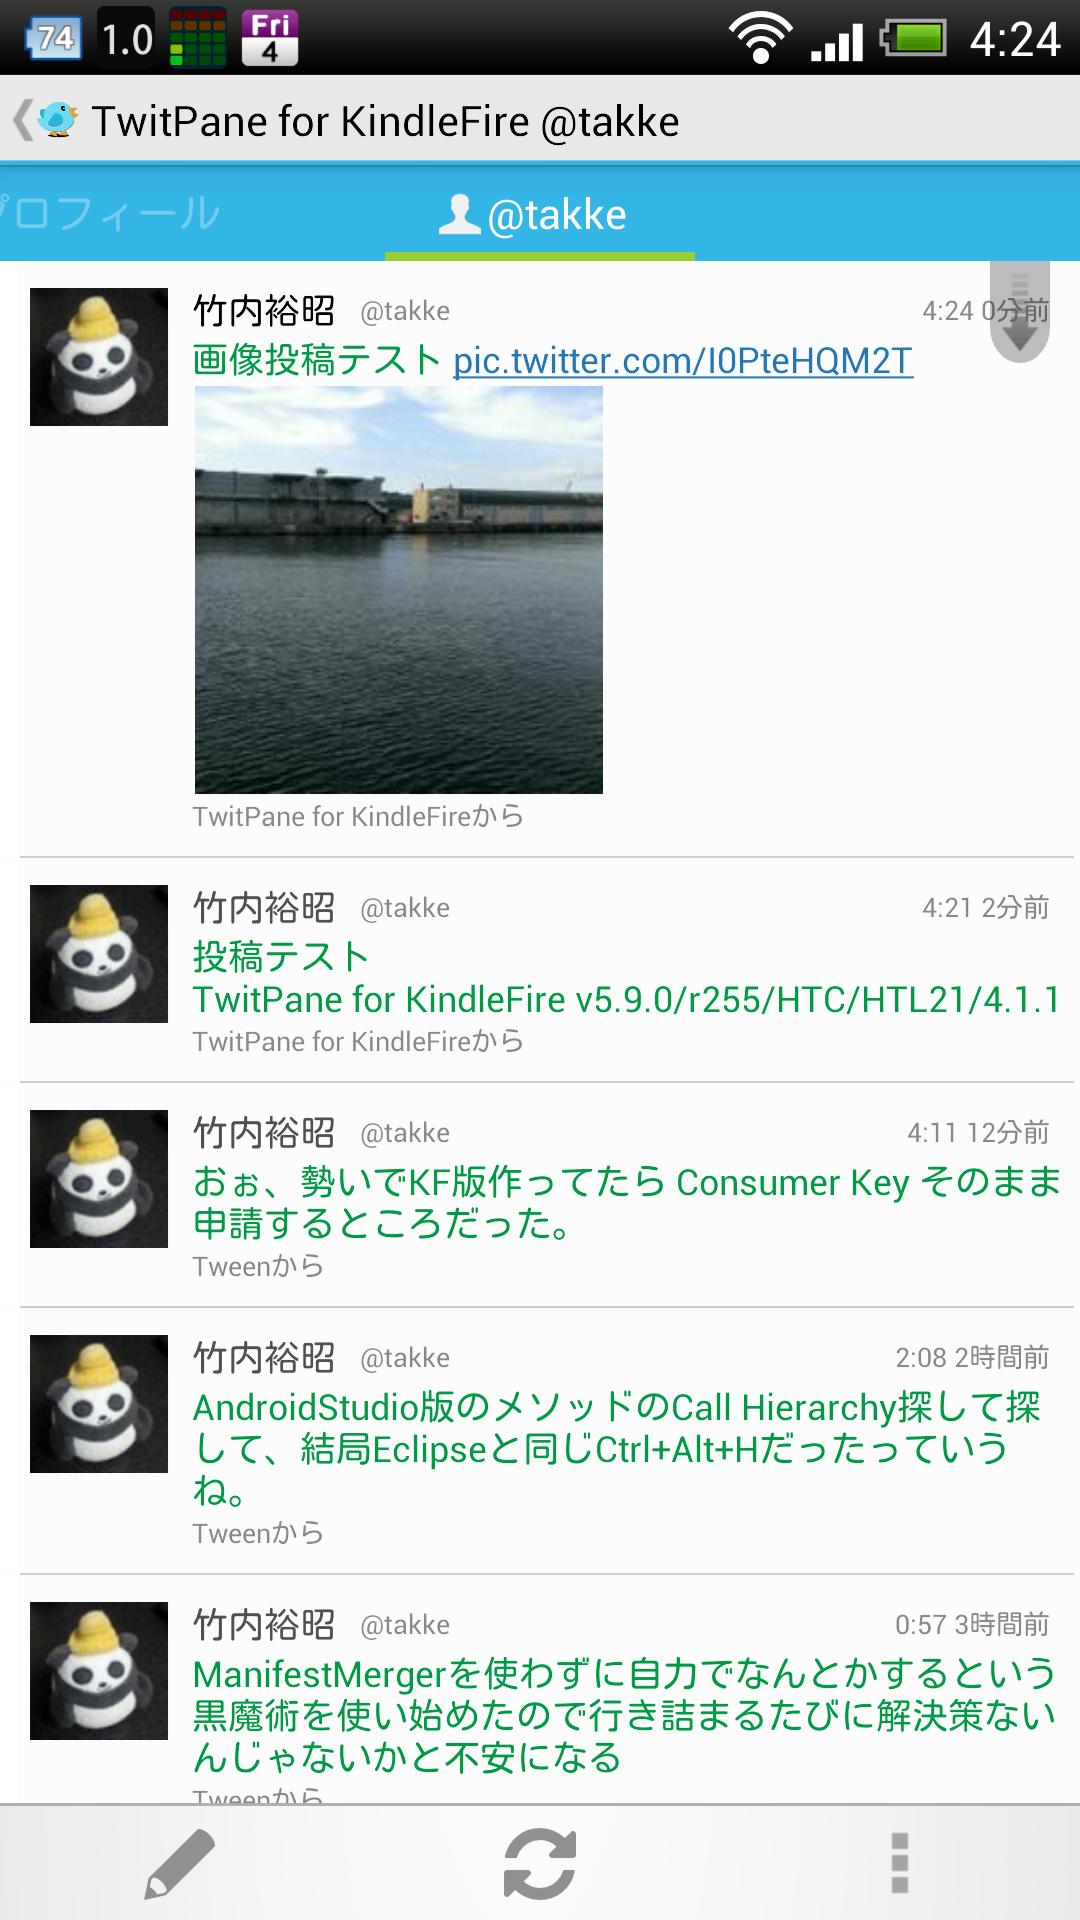 TwitPane for KindleFire